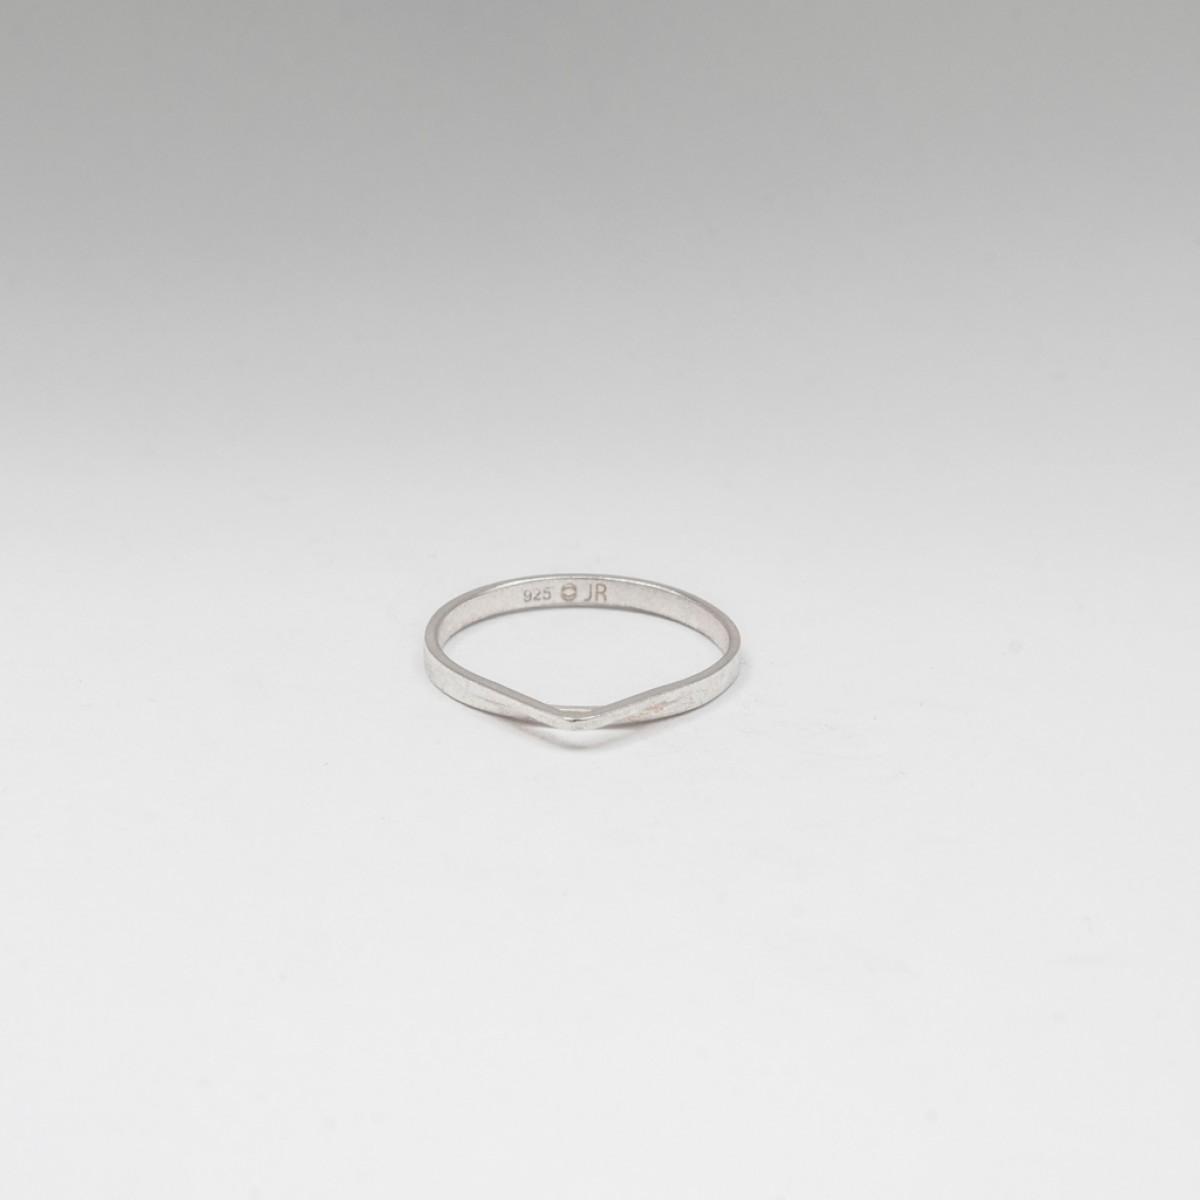 Jonathan Radetz Jewellery, Ring TRI, Silber 925